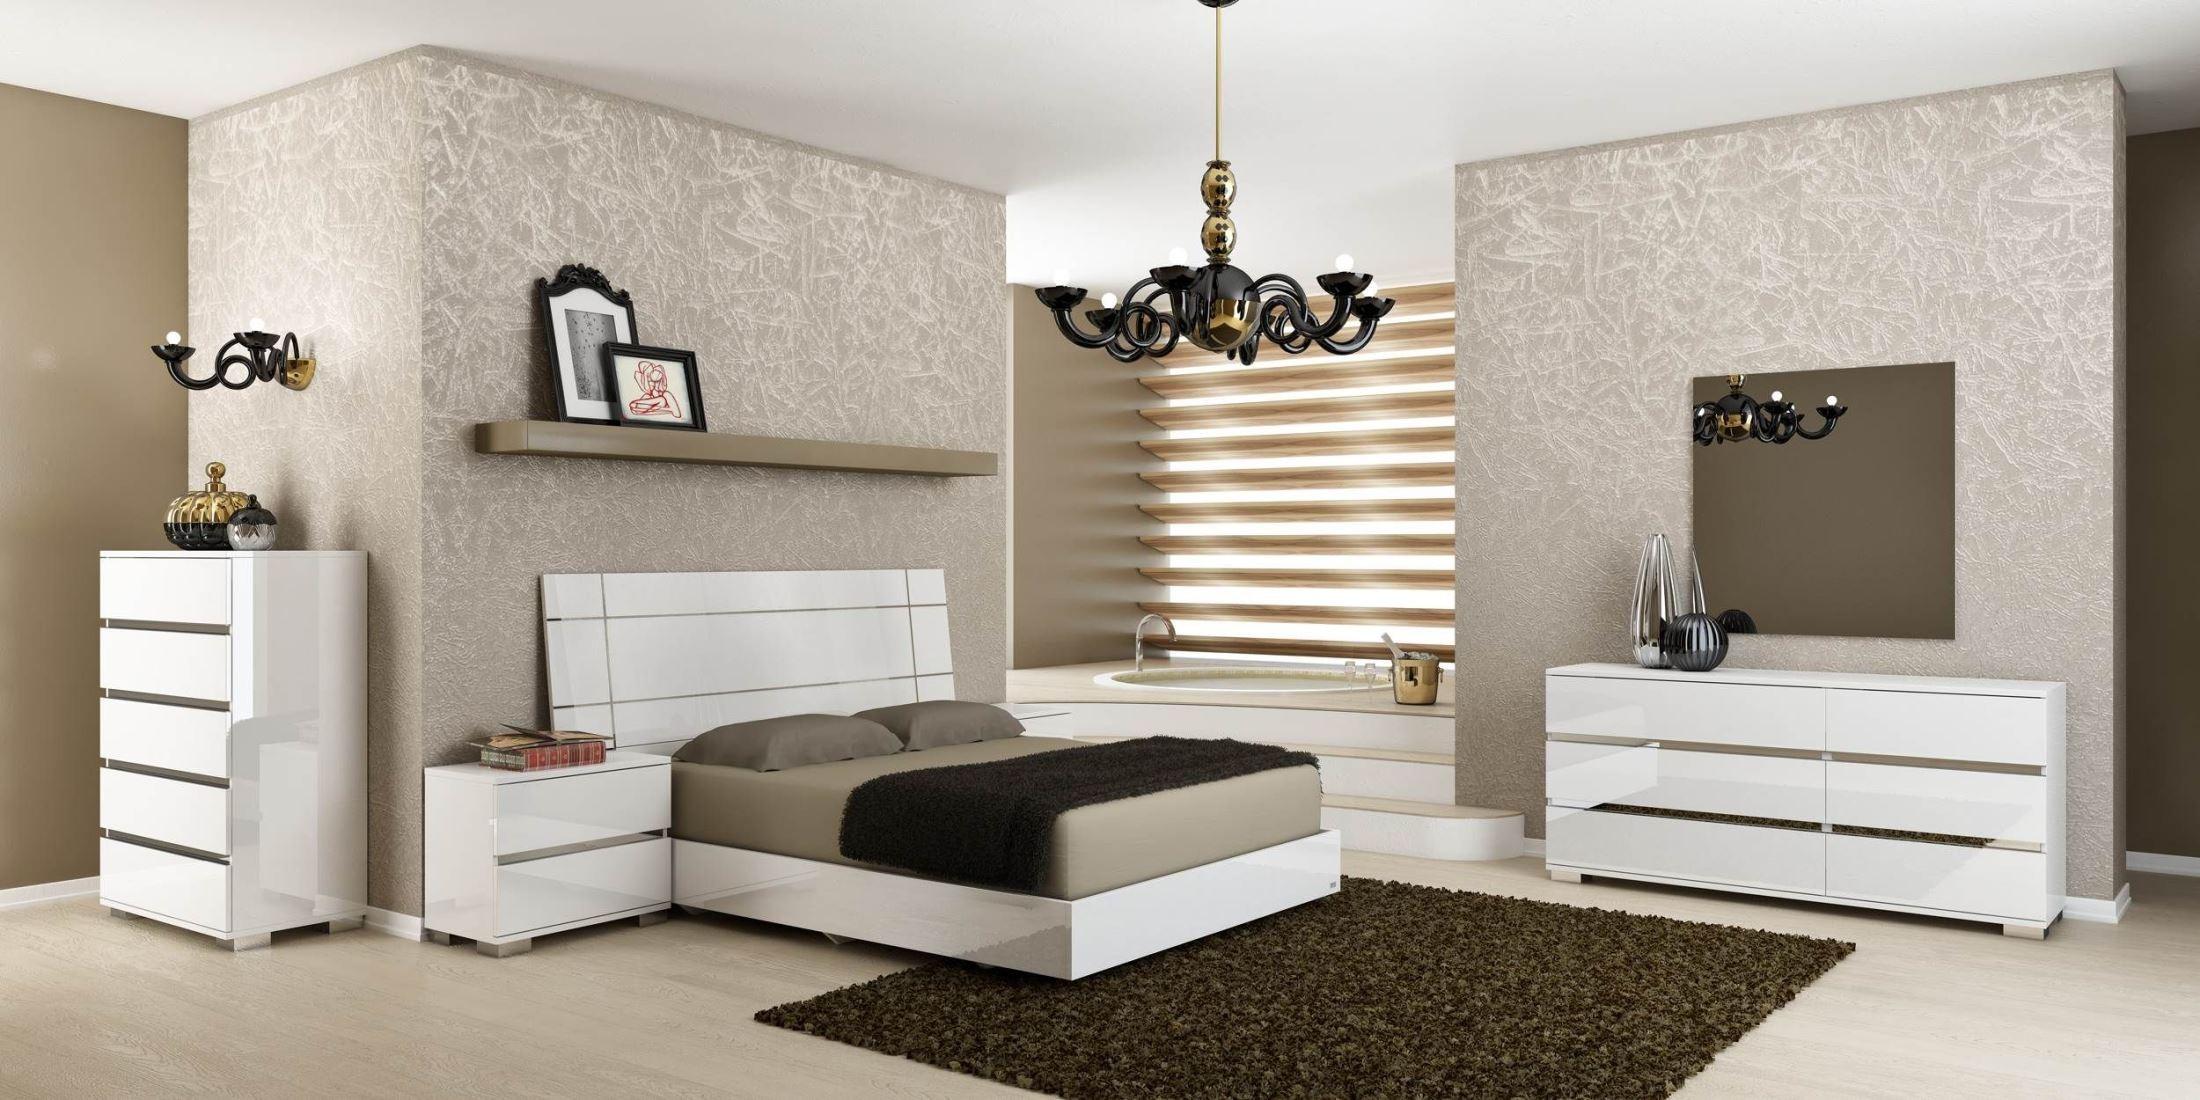 vivente icon white high gloss platform bedroom set from star